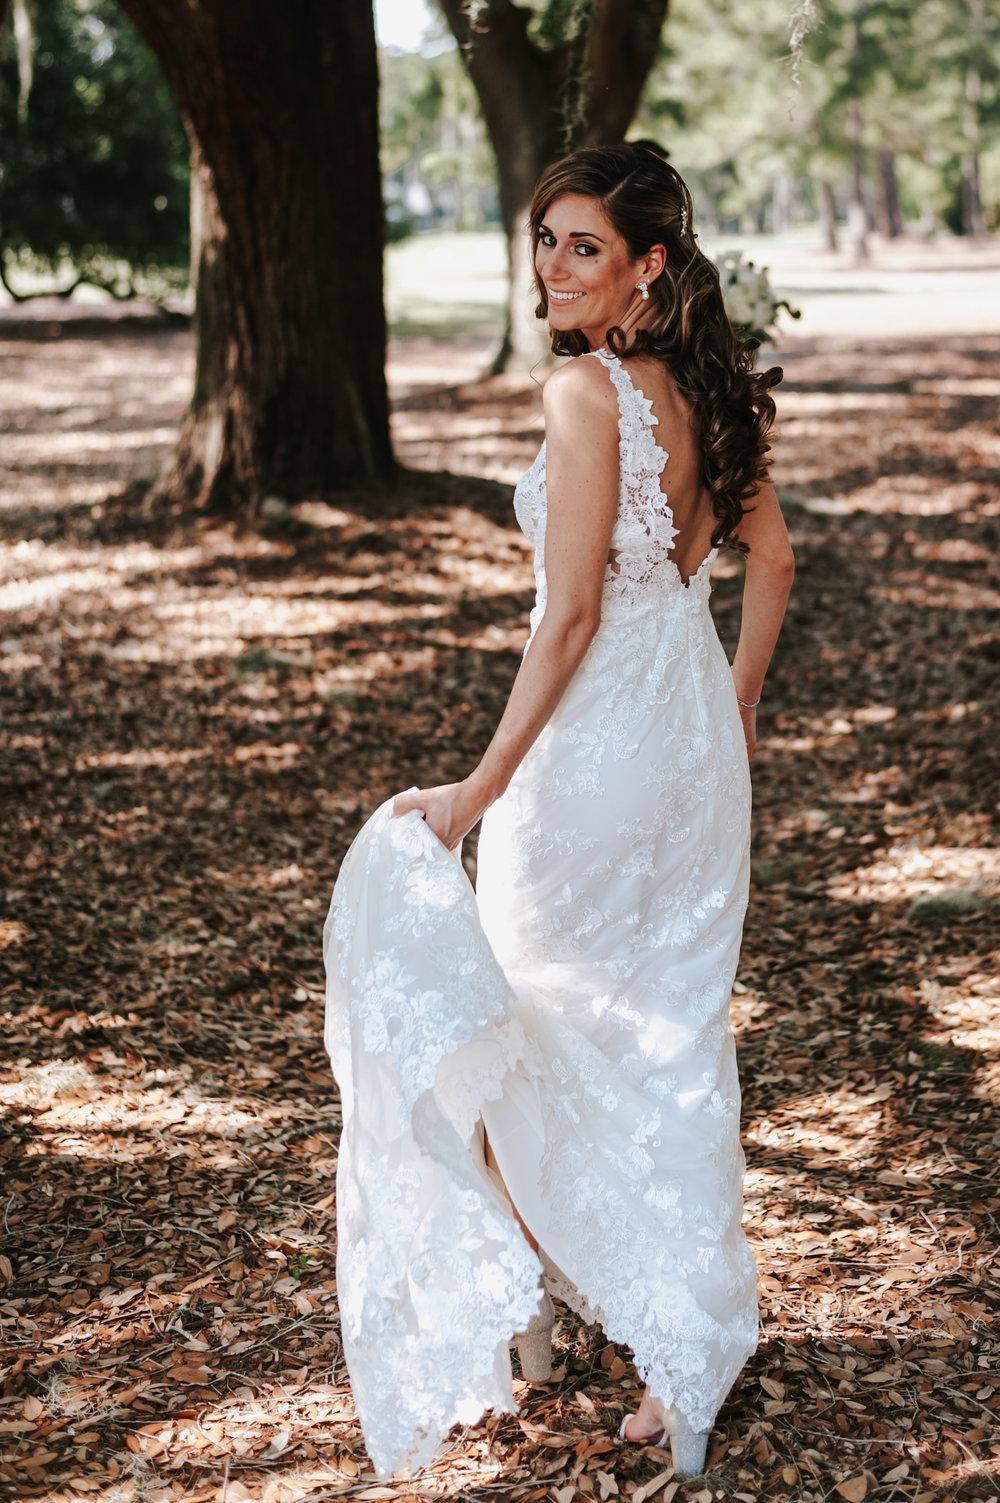 North-South-Carolina-Wedding-Engagement-Photographer-Spartanburg-Greenville-Columbia-Charleston-218.JPG